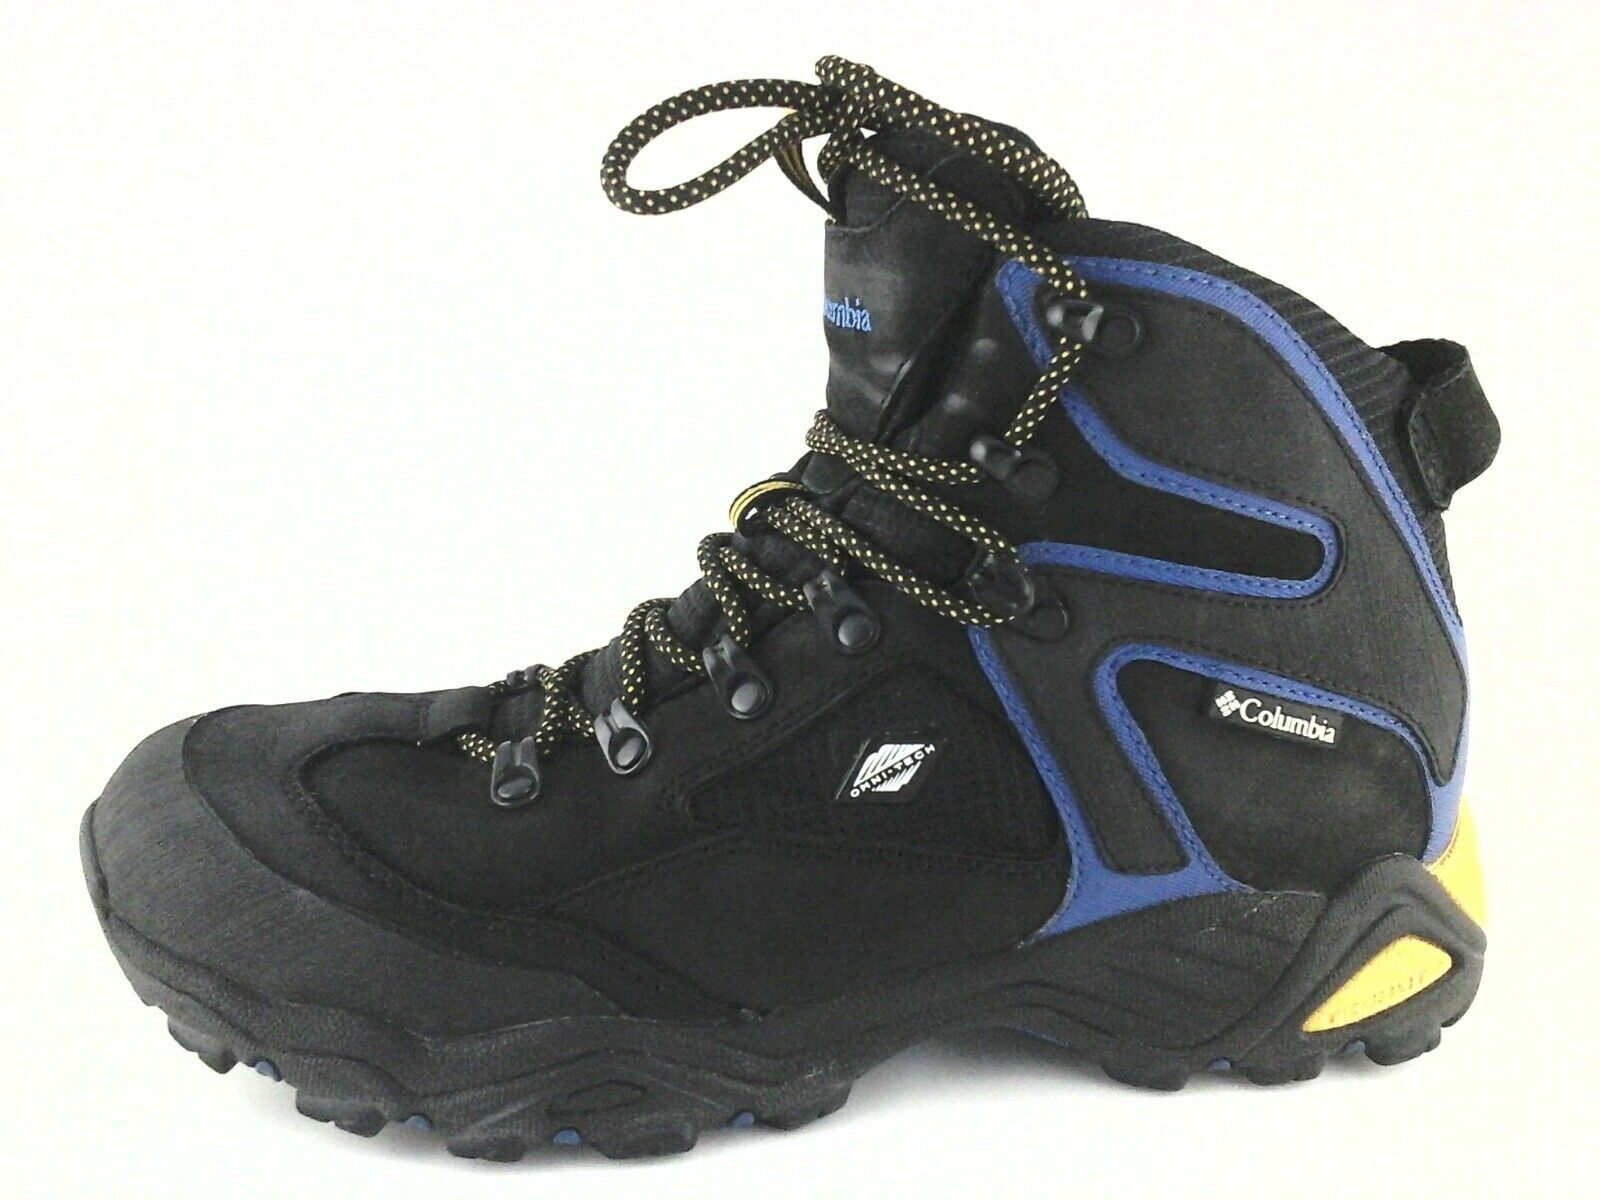 0da3d470191 Details about EUC $140 Columbia Mens BM3565 Pole Creek Omni-Tech Hiking  Boot US 9 UK 8.5 EU 42